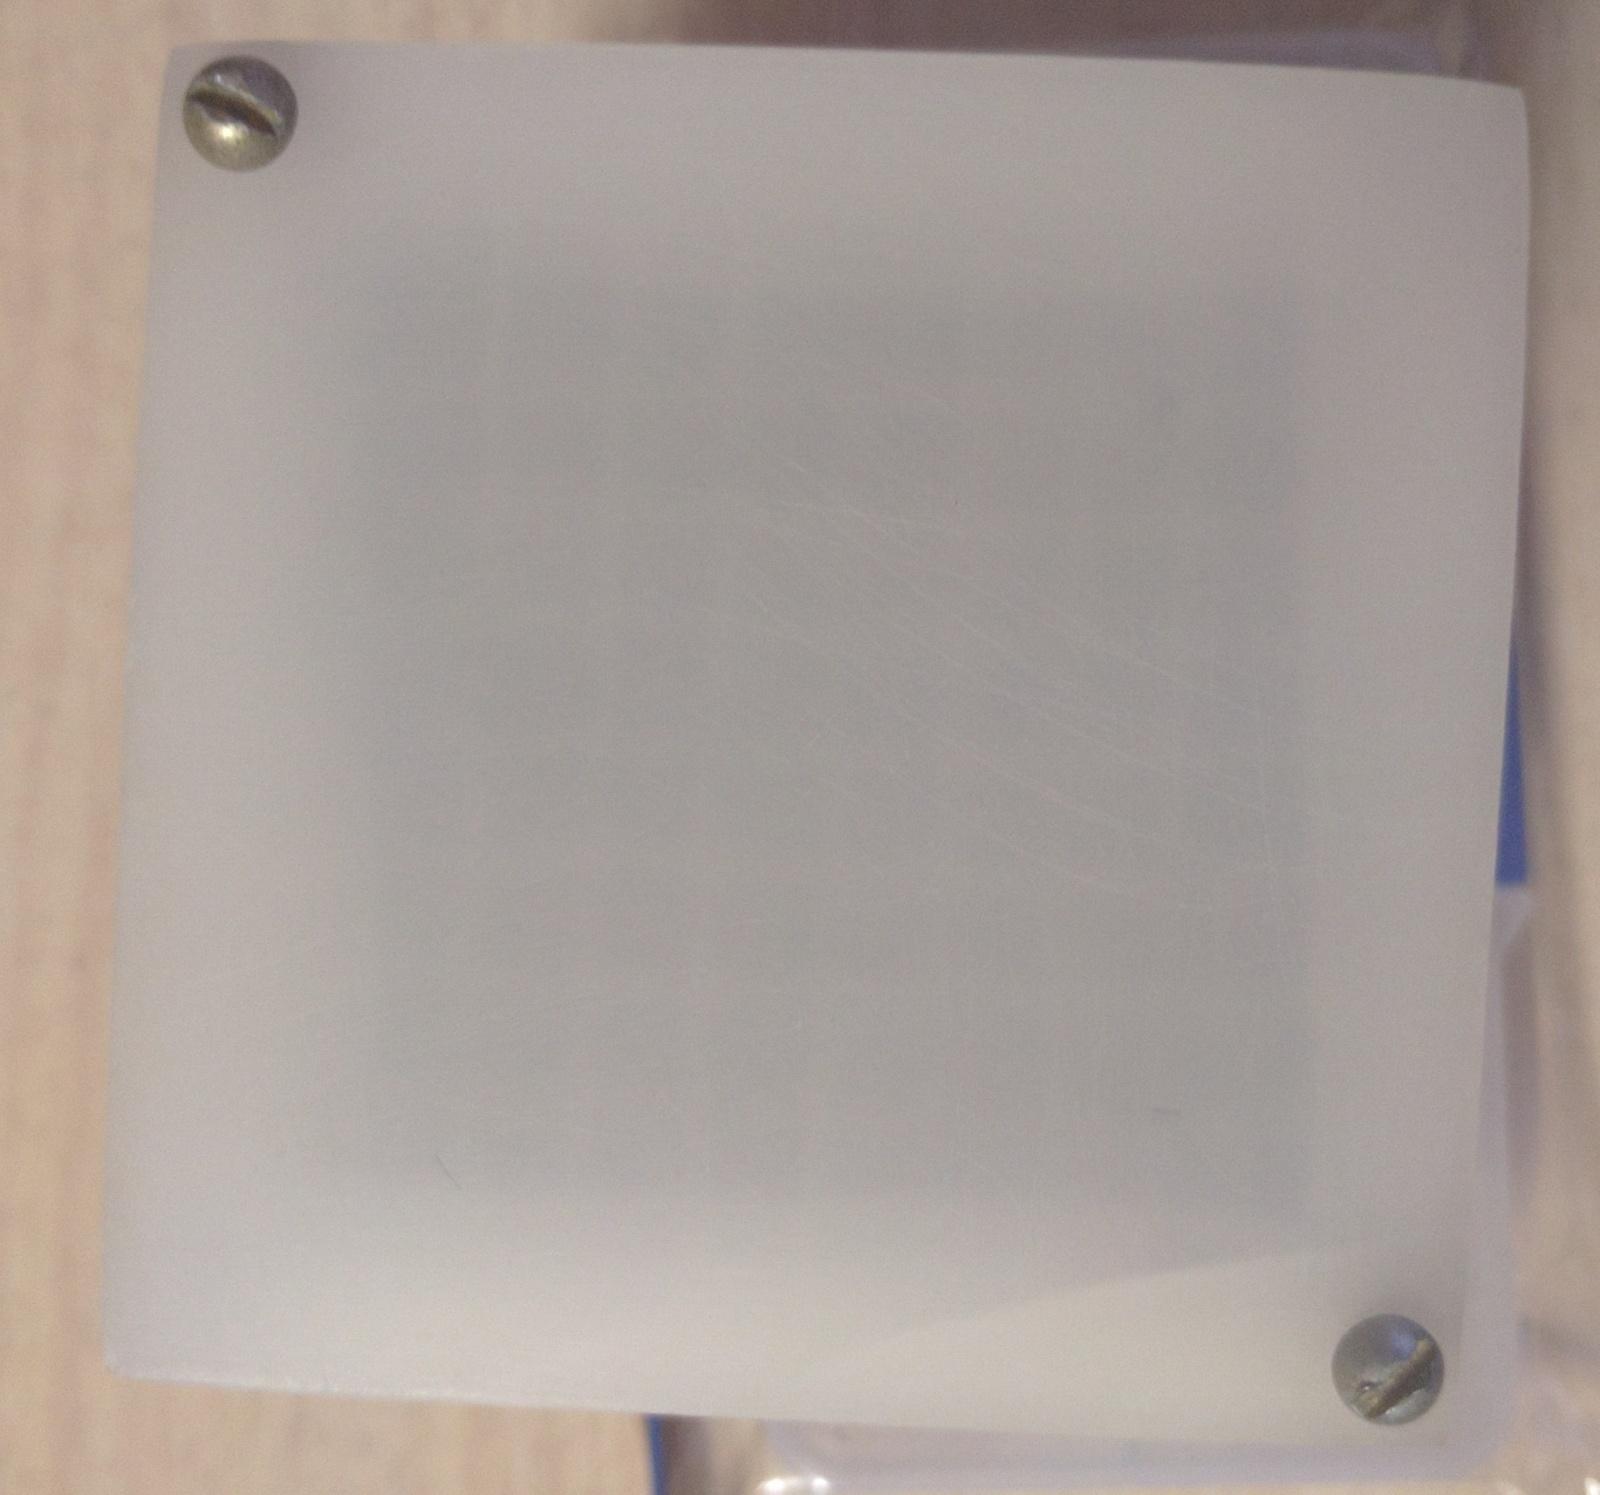 Прототип светодиодного табло на 262 144 комбинации цветов и 64 пикселя - 7